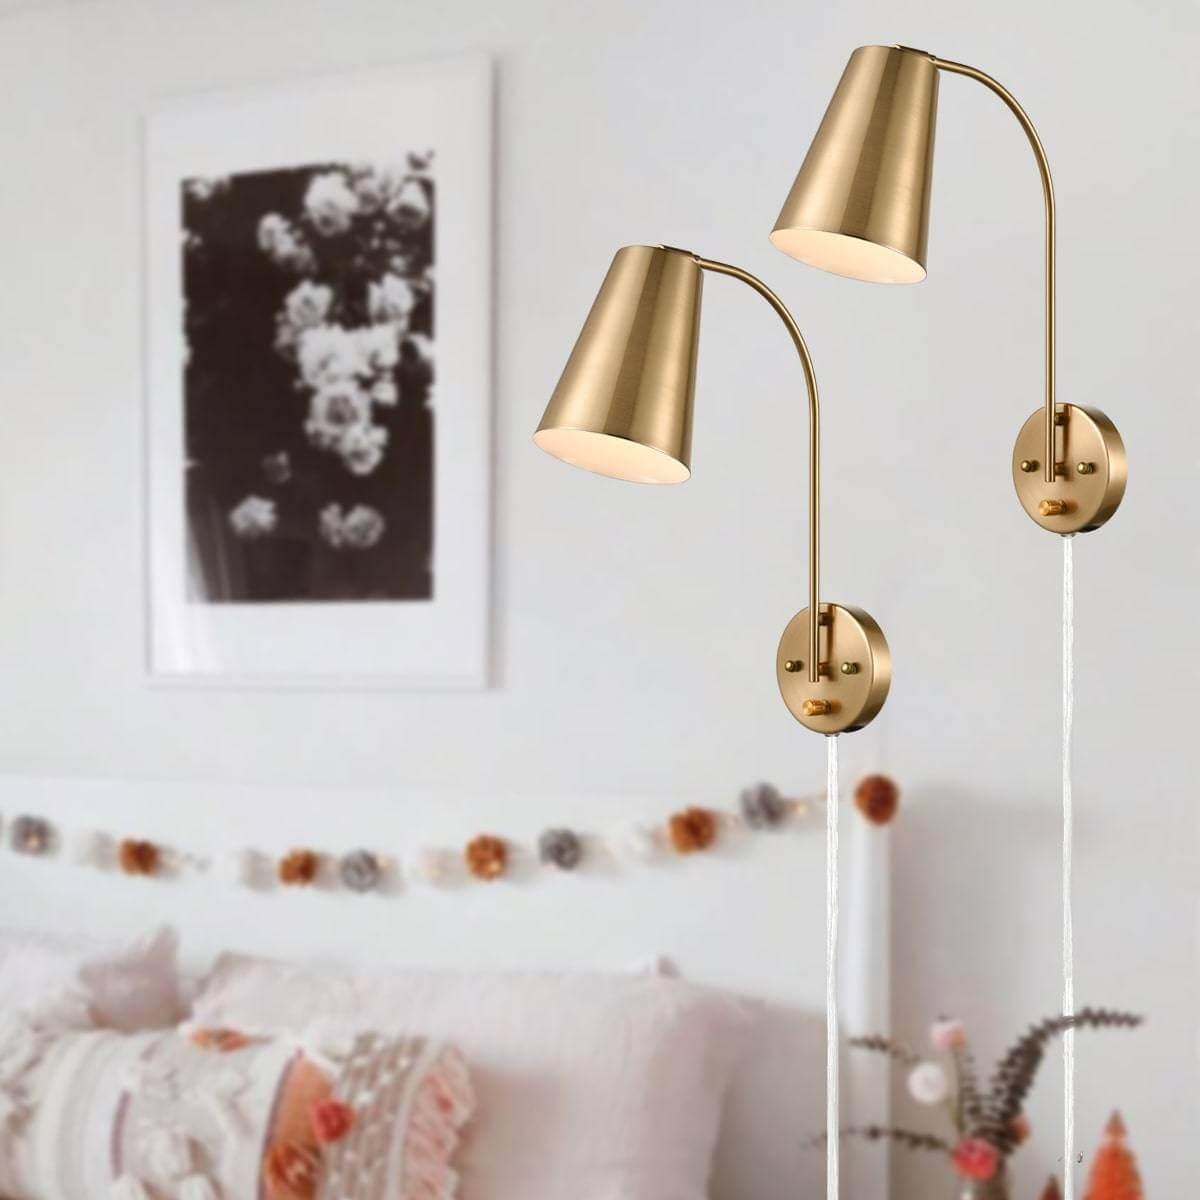 Modern Brass Wall Mount Plug-in Wall Lights Set of 2